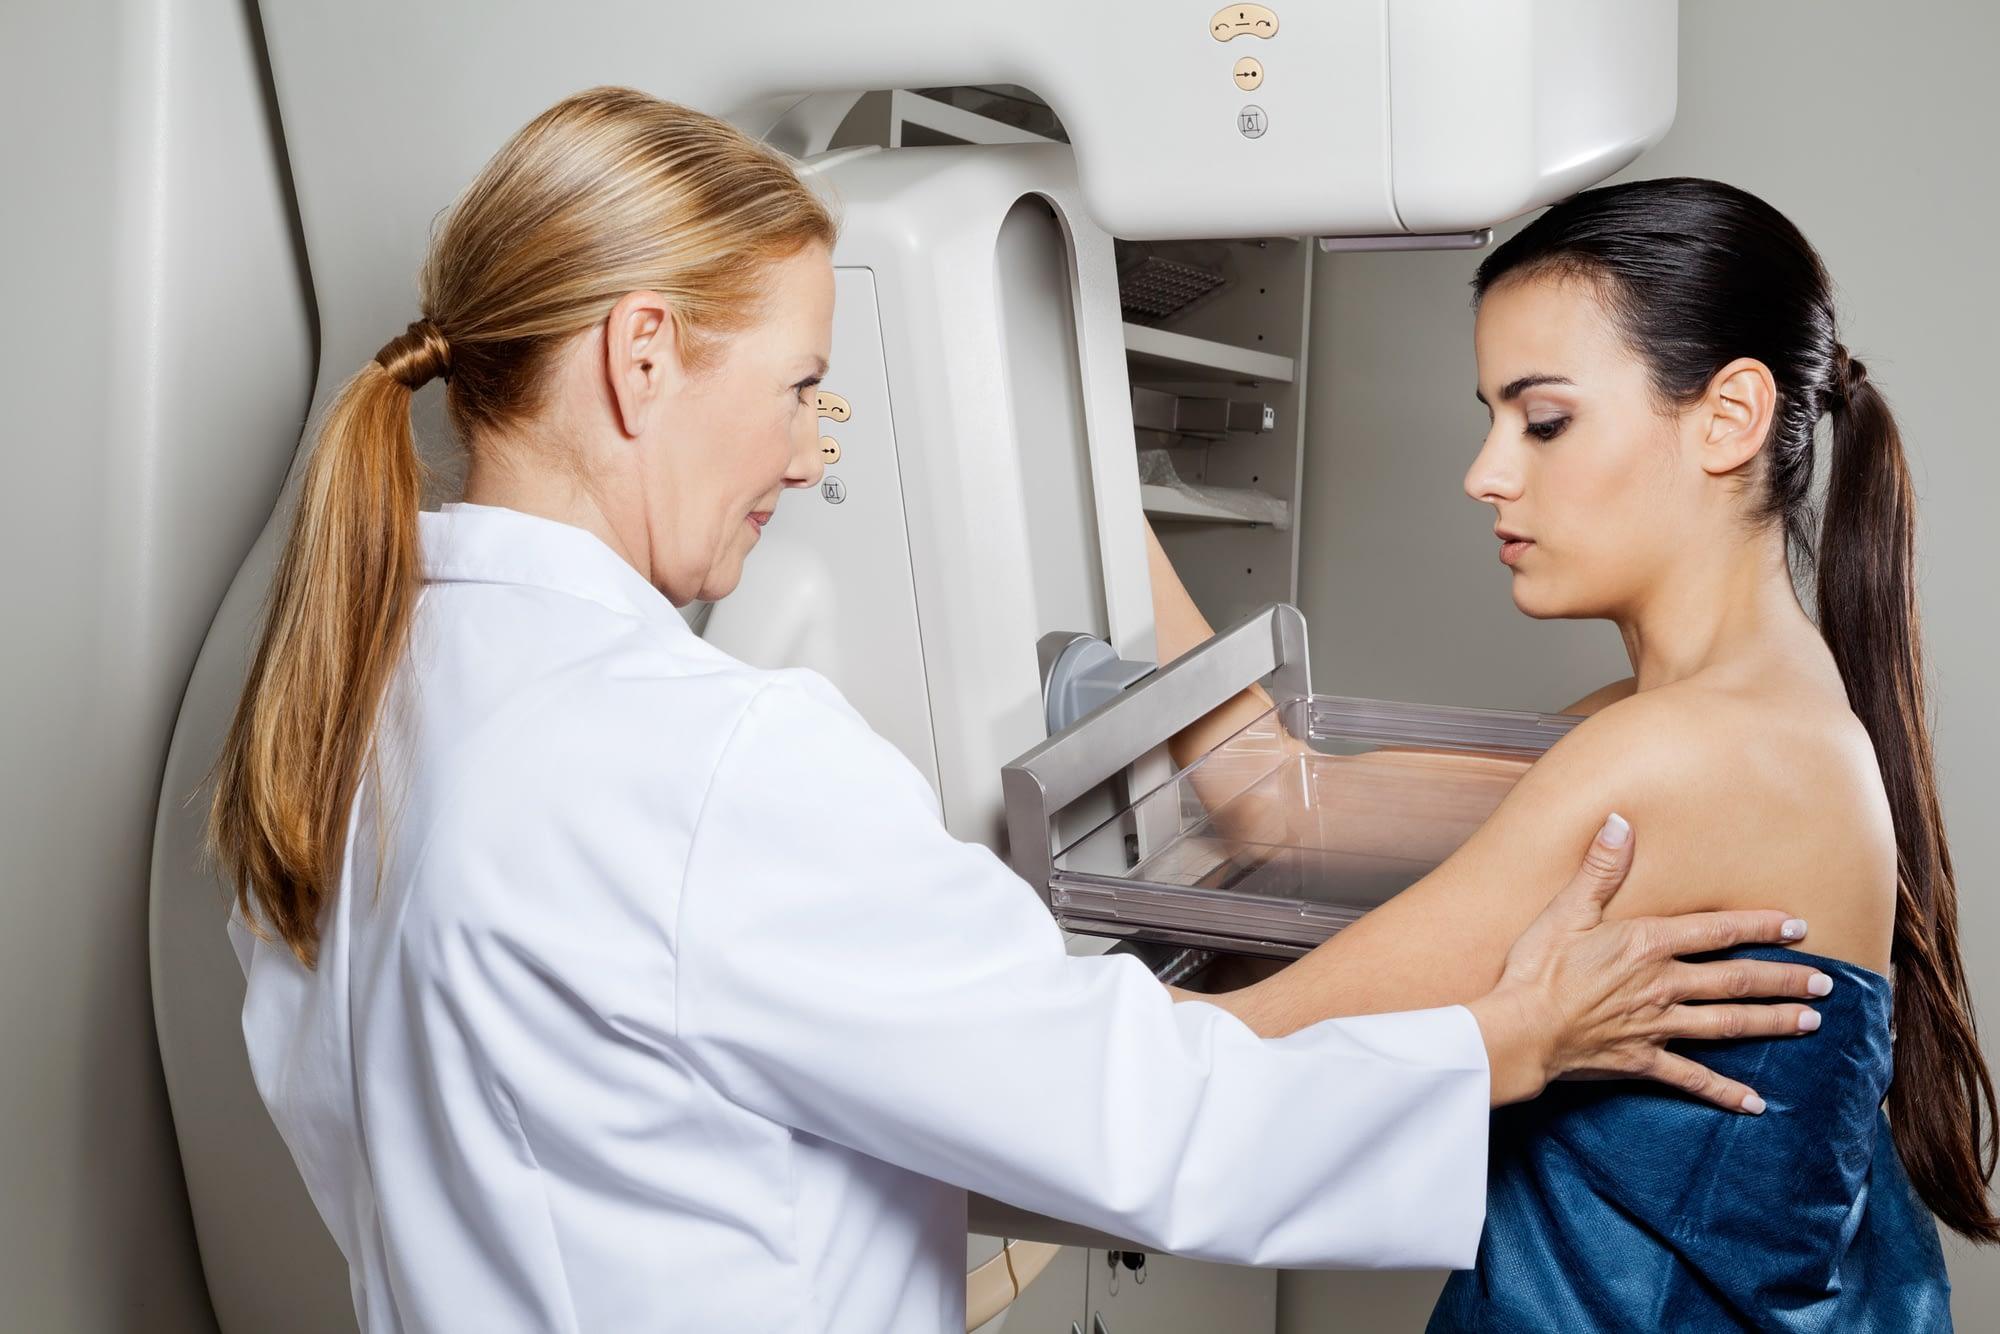 mammogram with implants